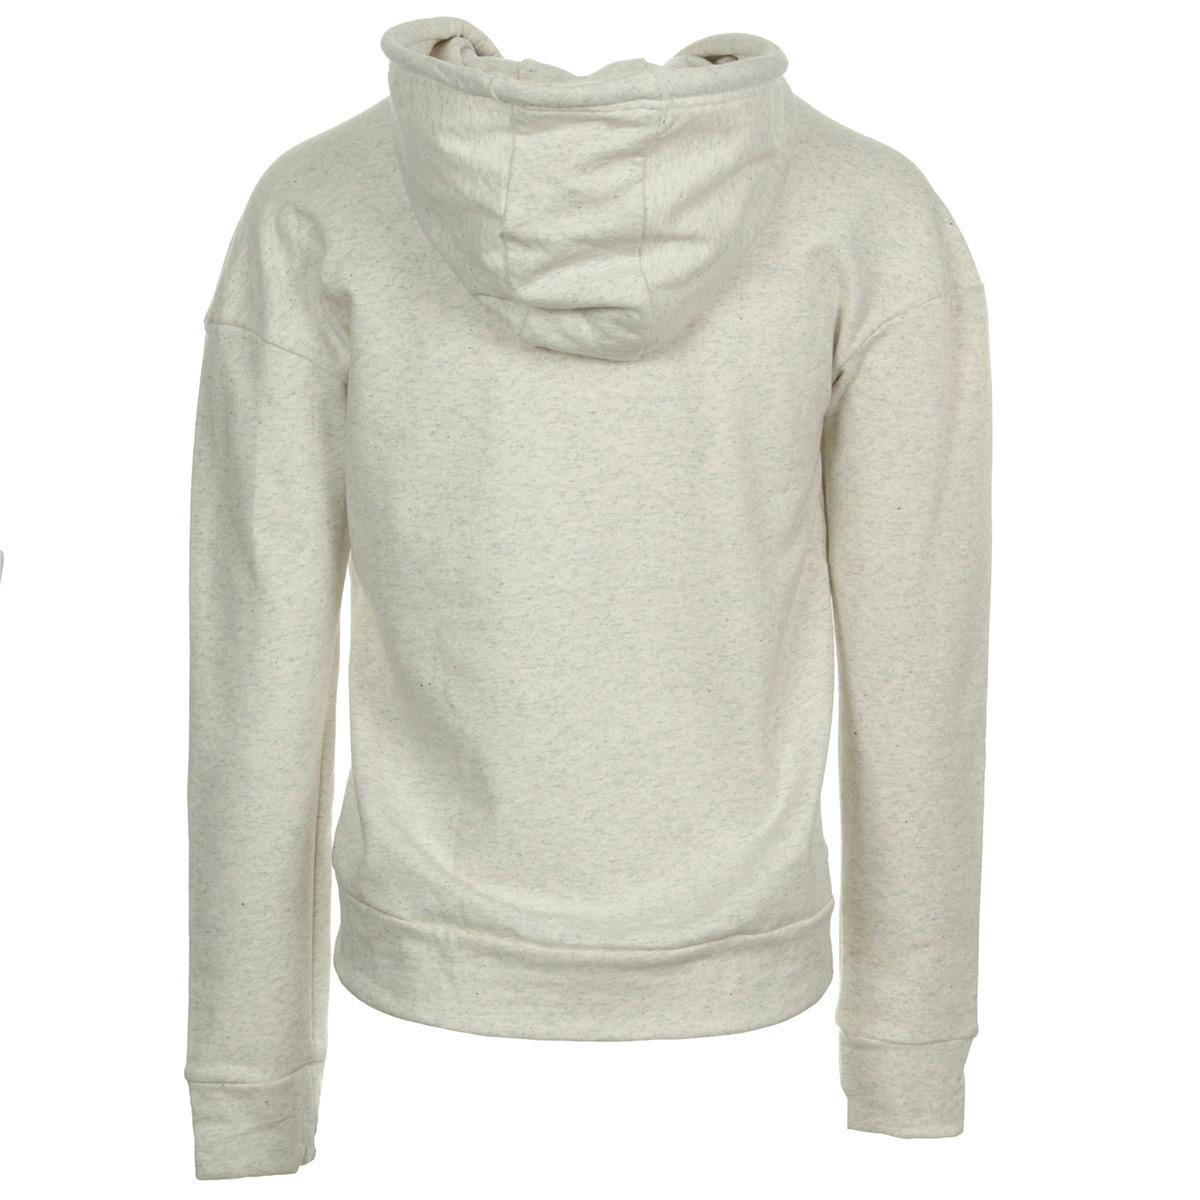 adidas Co Fl Hoody AX7537, Sweats femme